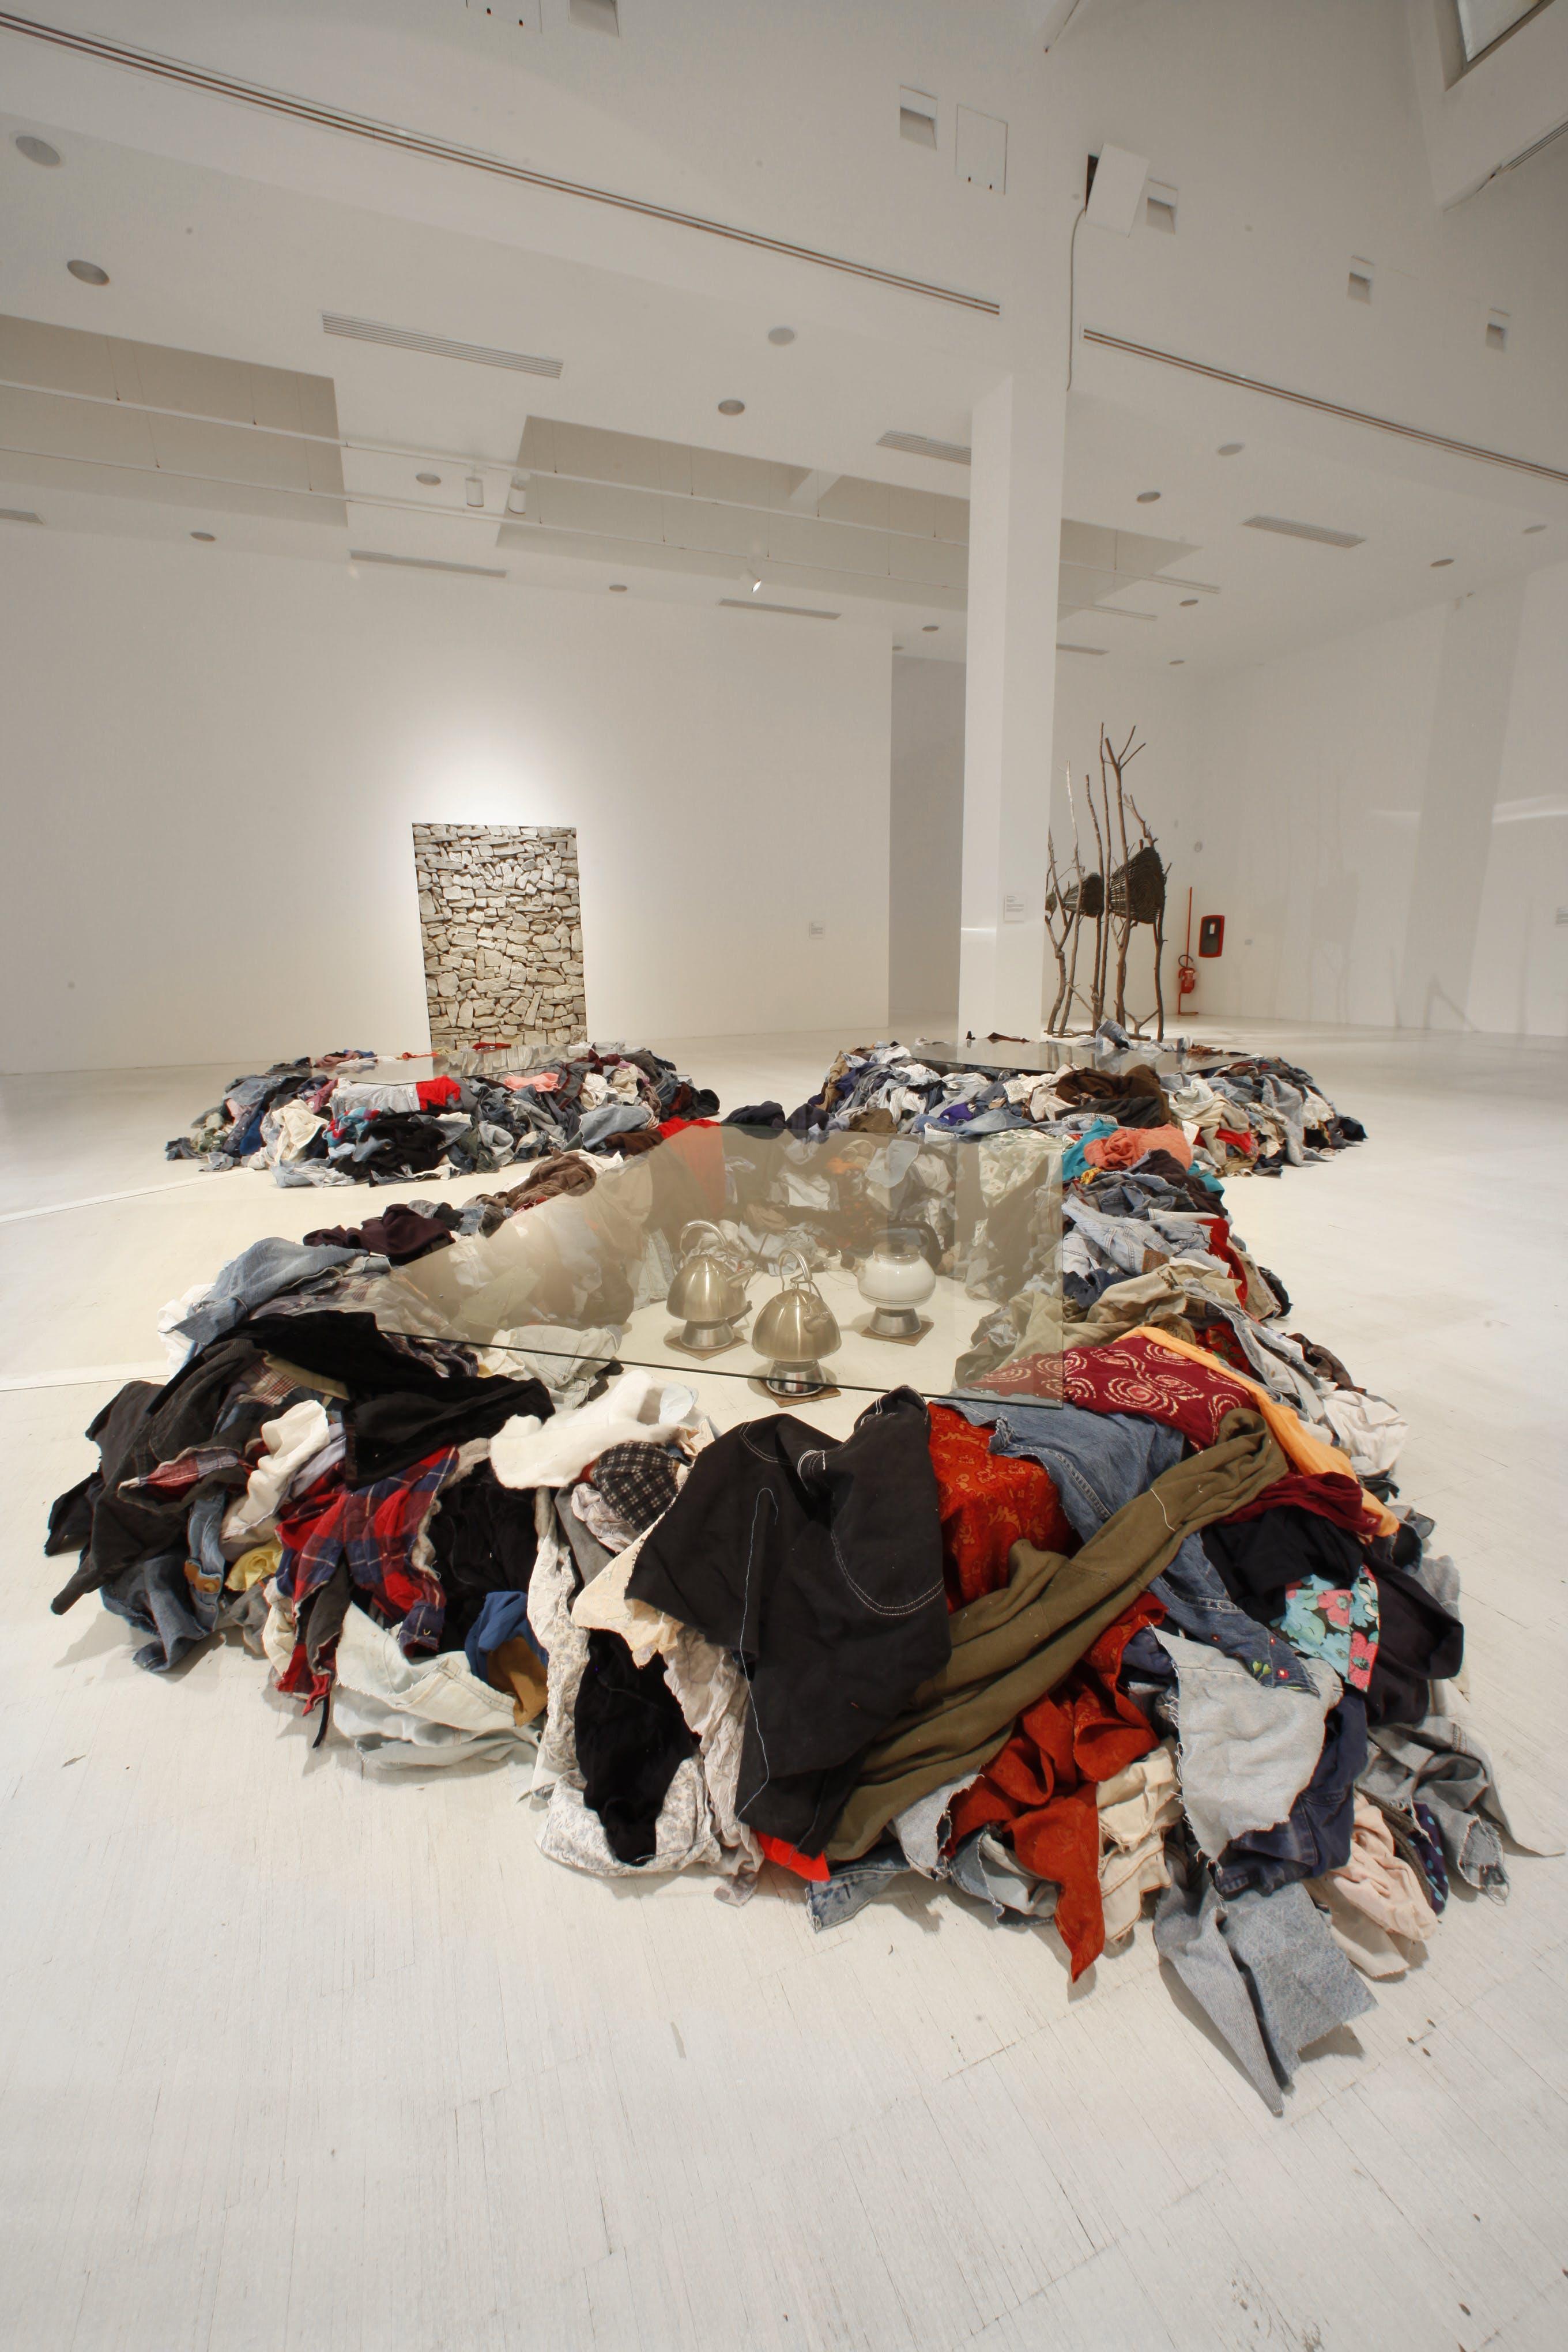 Arte Povera 1967-2011, curated by Germano Celant, 2011, Triennale Milano, photo by Dario Curatolo